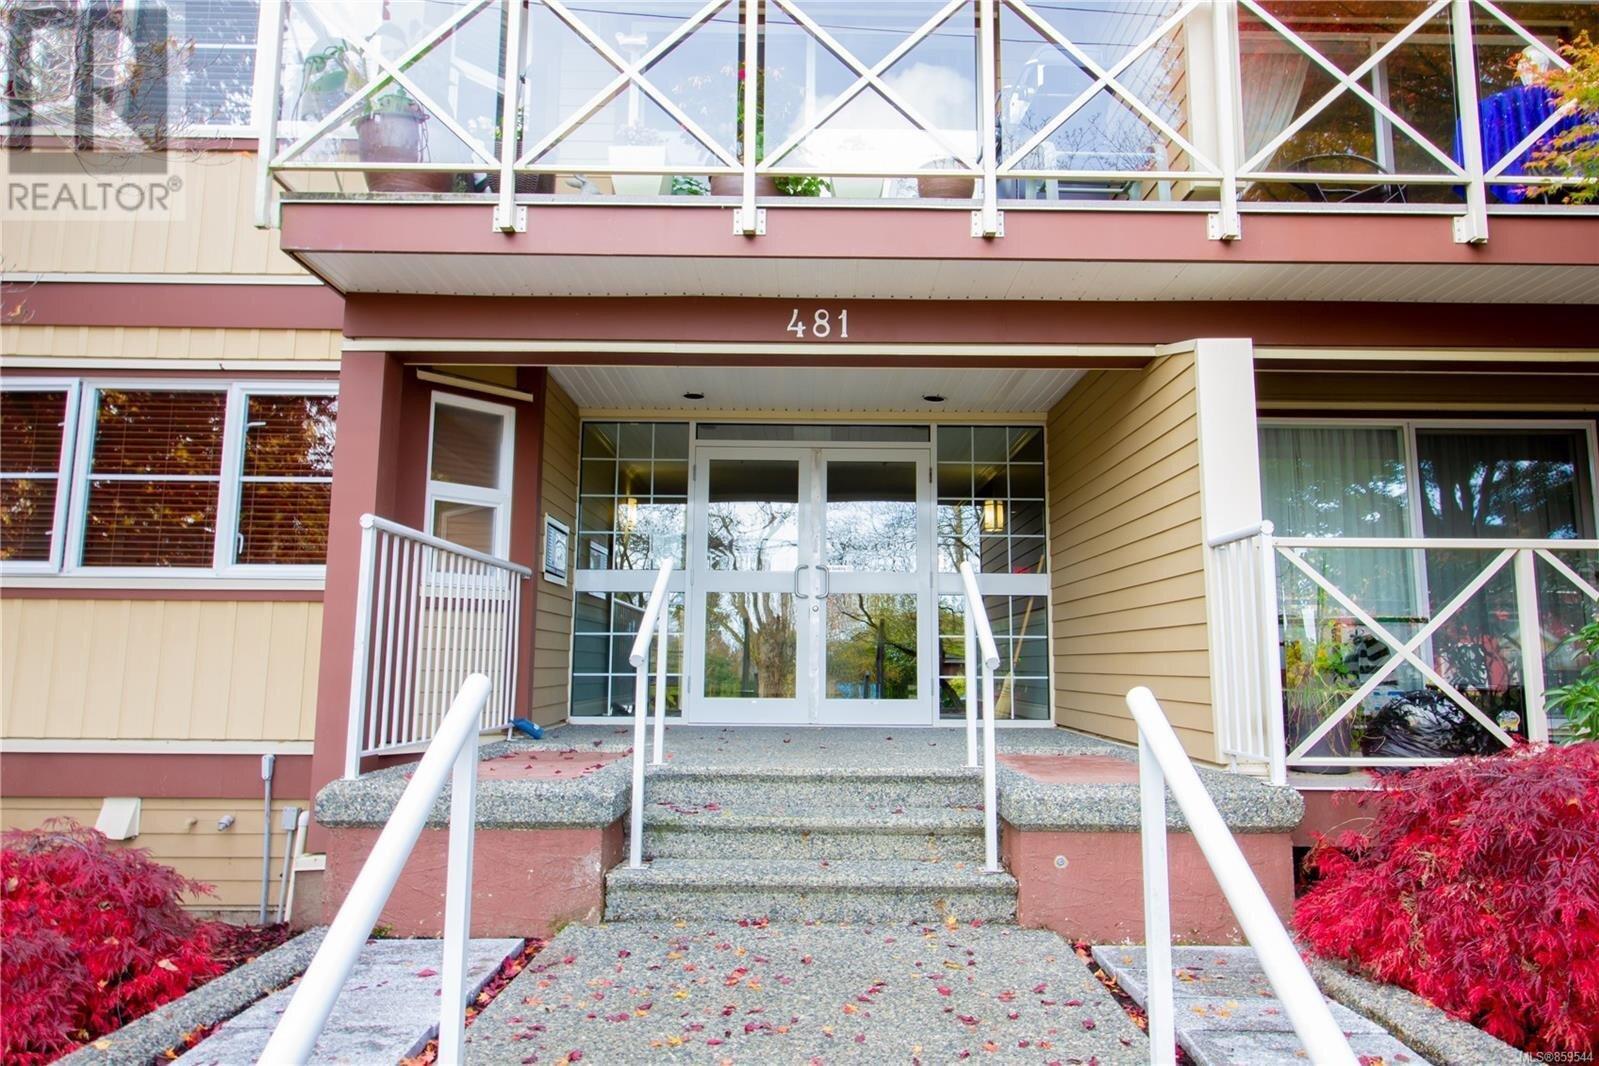 Condo for sale at 481 Kennedy St Unit 403 Nanaimo British Columbia - MLS: 859544